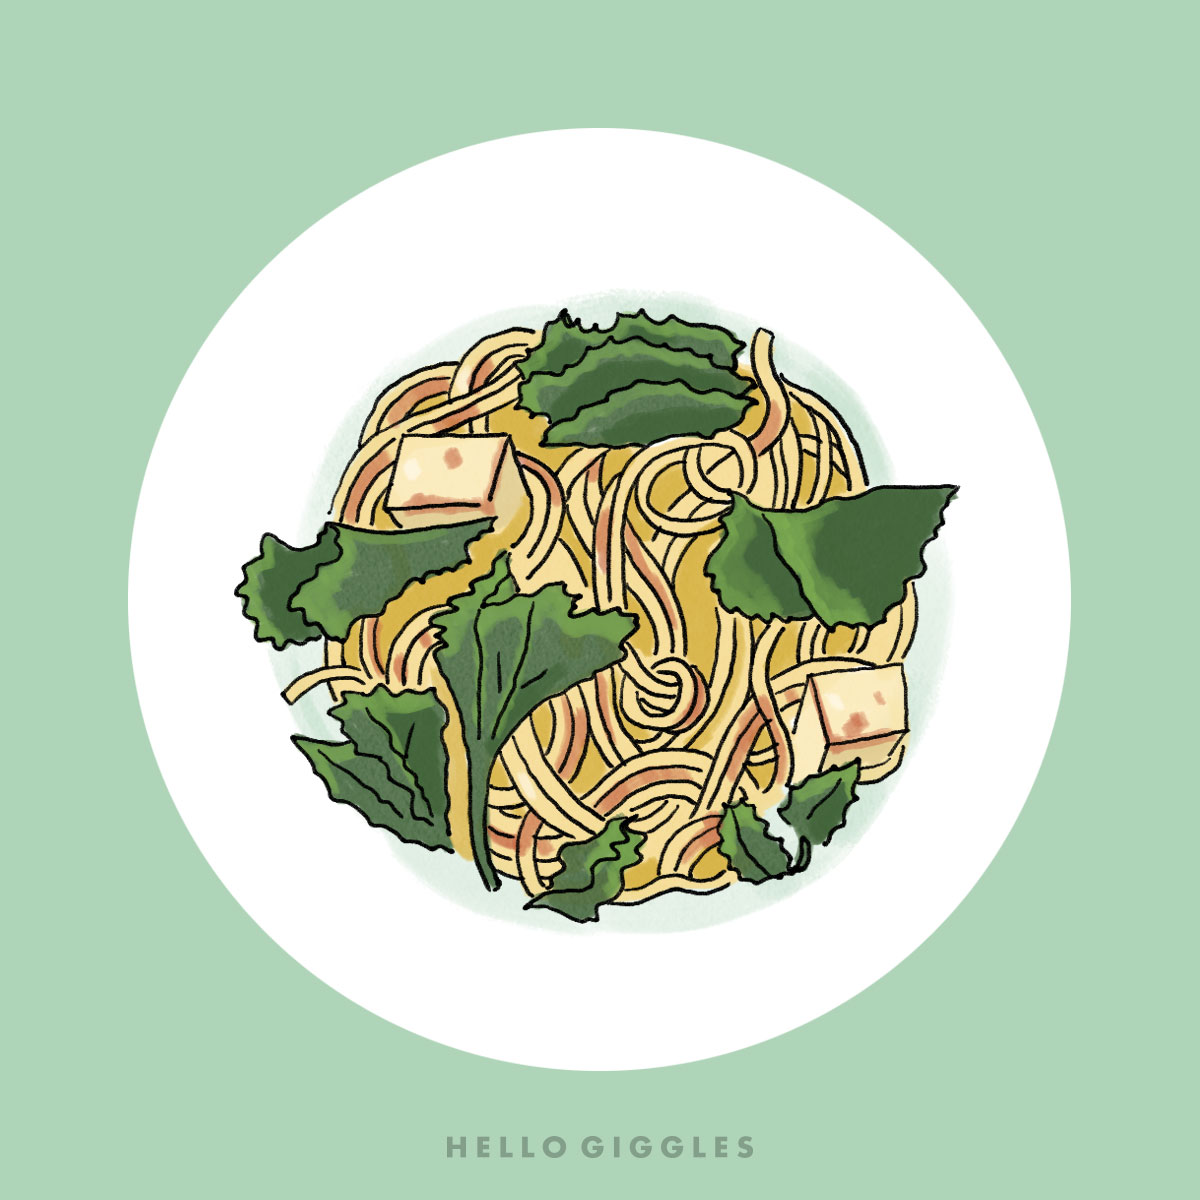 Kale_spaghetti.jpg